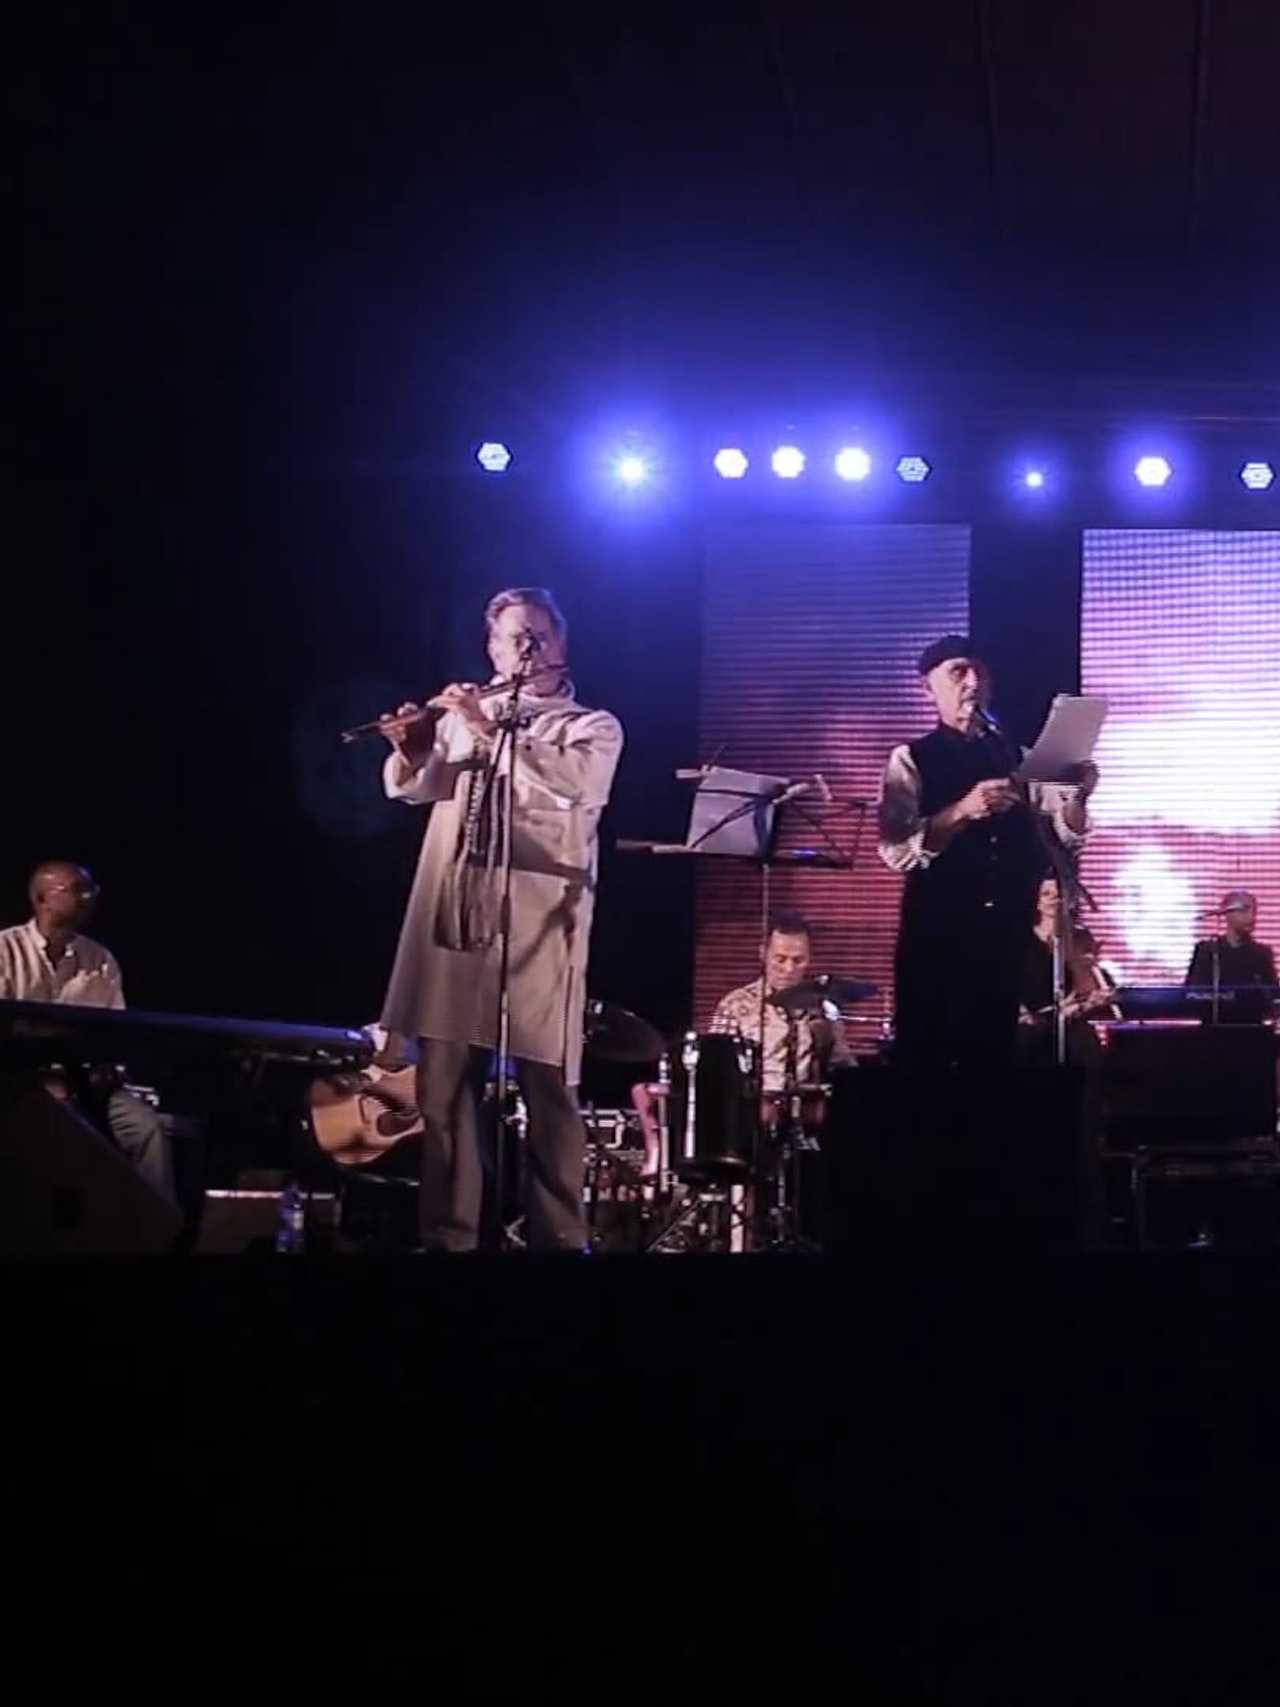 EXIB MÚSICA GALA - ALENTEJO, PORTIGAL 2017